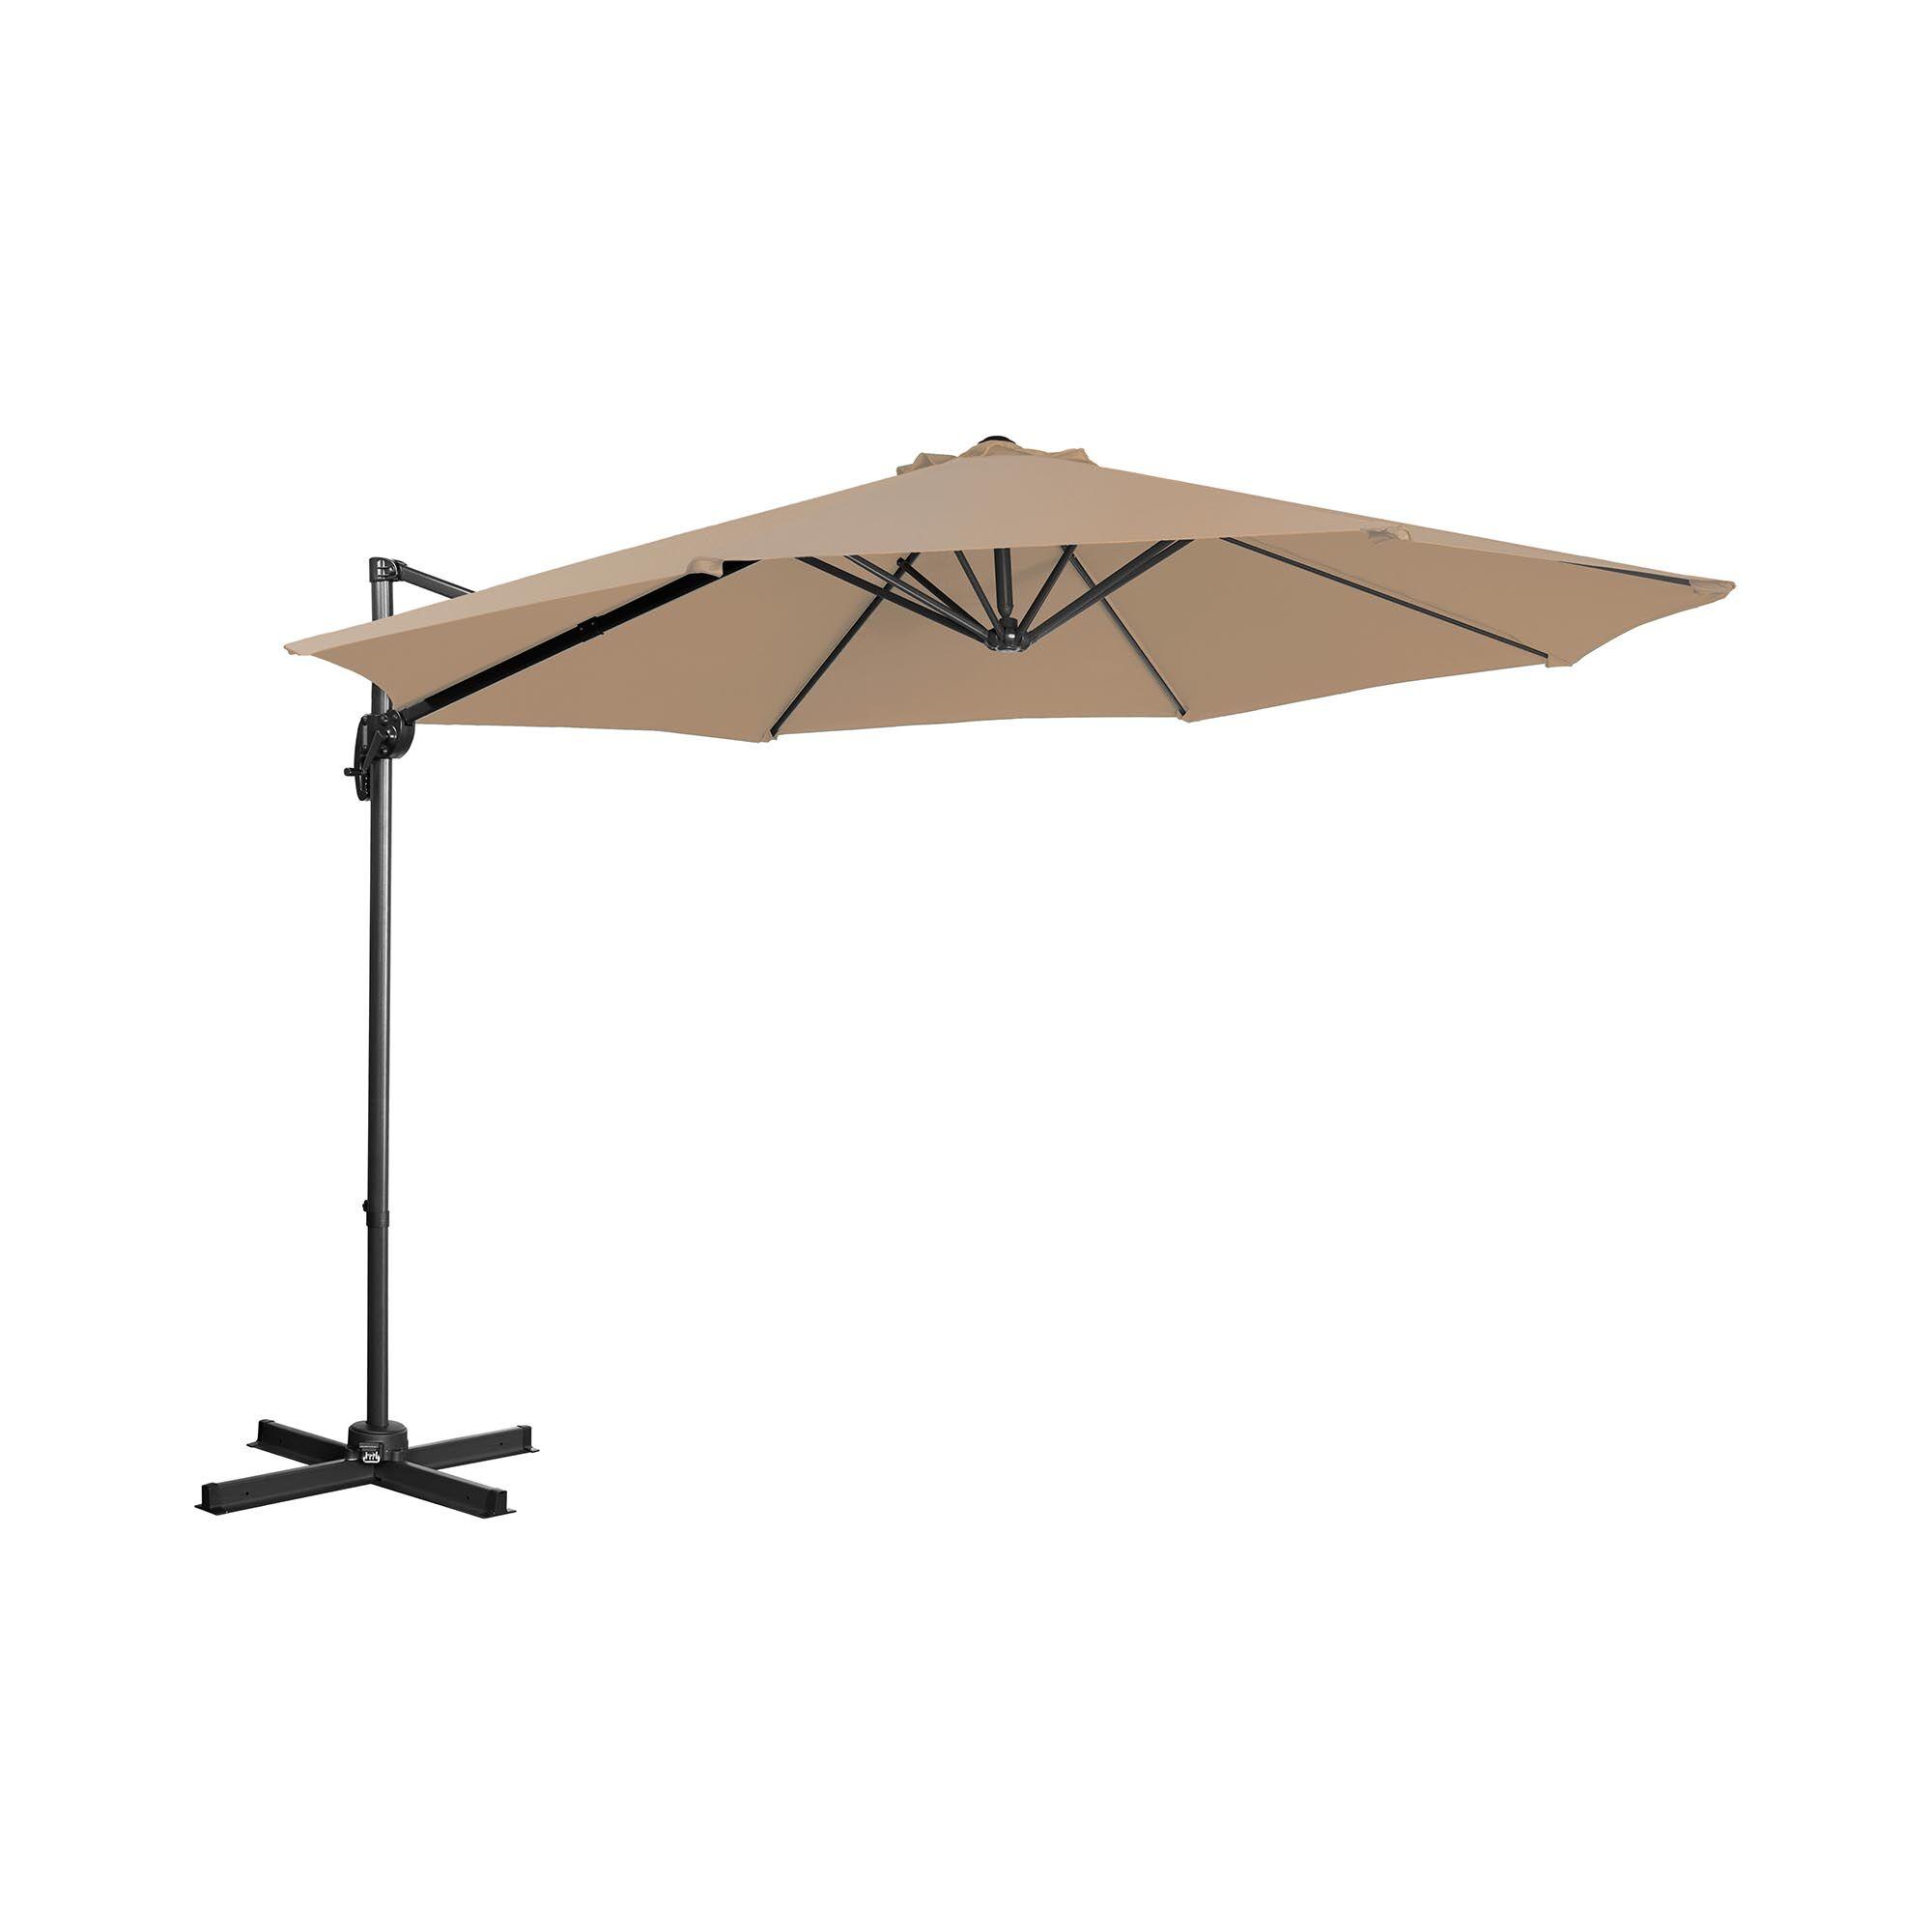 Uniprodo Hanging Parasol - taupe - round - Ã 300 cm - rotatable